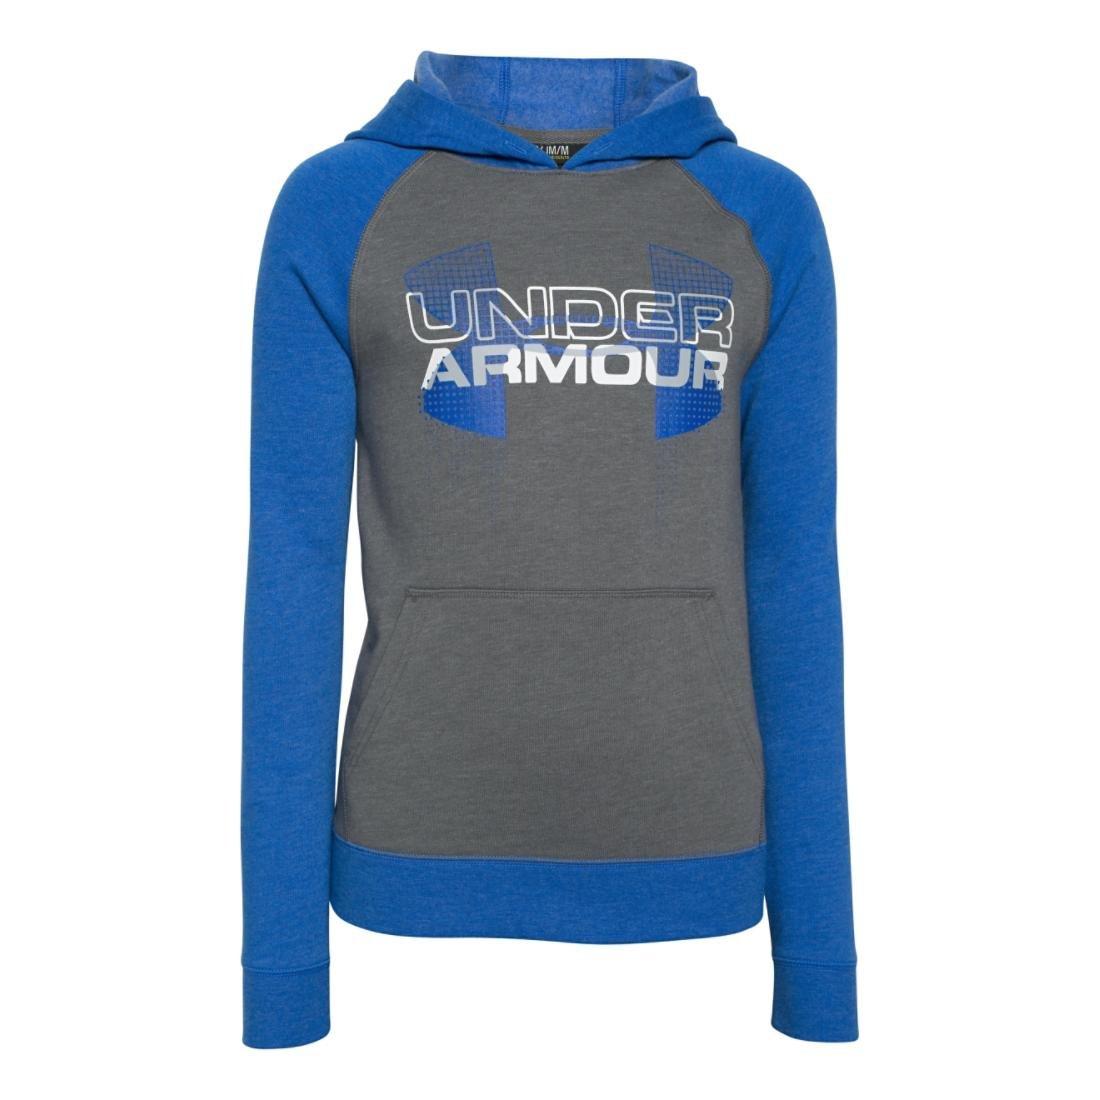 Under Armour Kids Boys Commuter Tri-Blend Hoodie Big Under Armour Apparel Boys 1271873-041